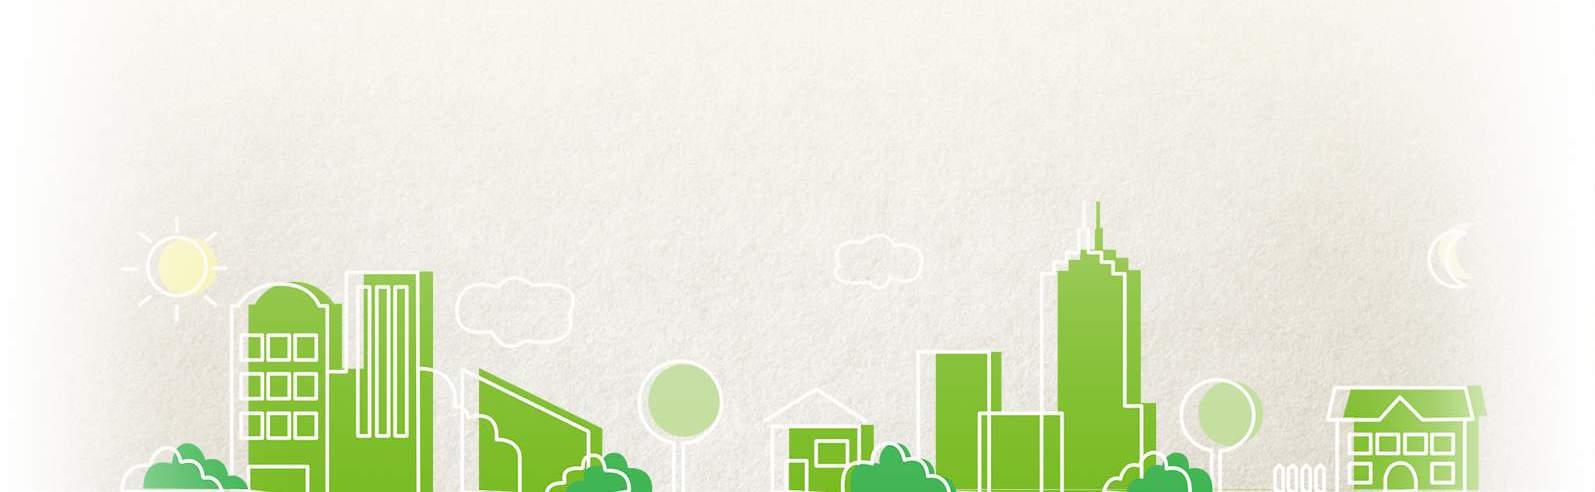 environmental-report-narrow